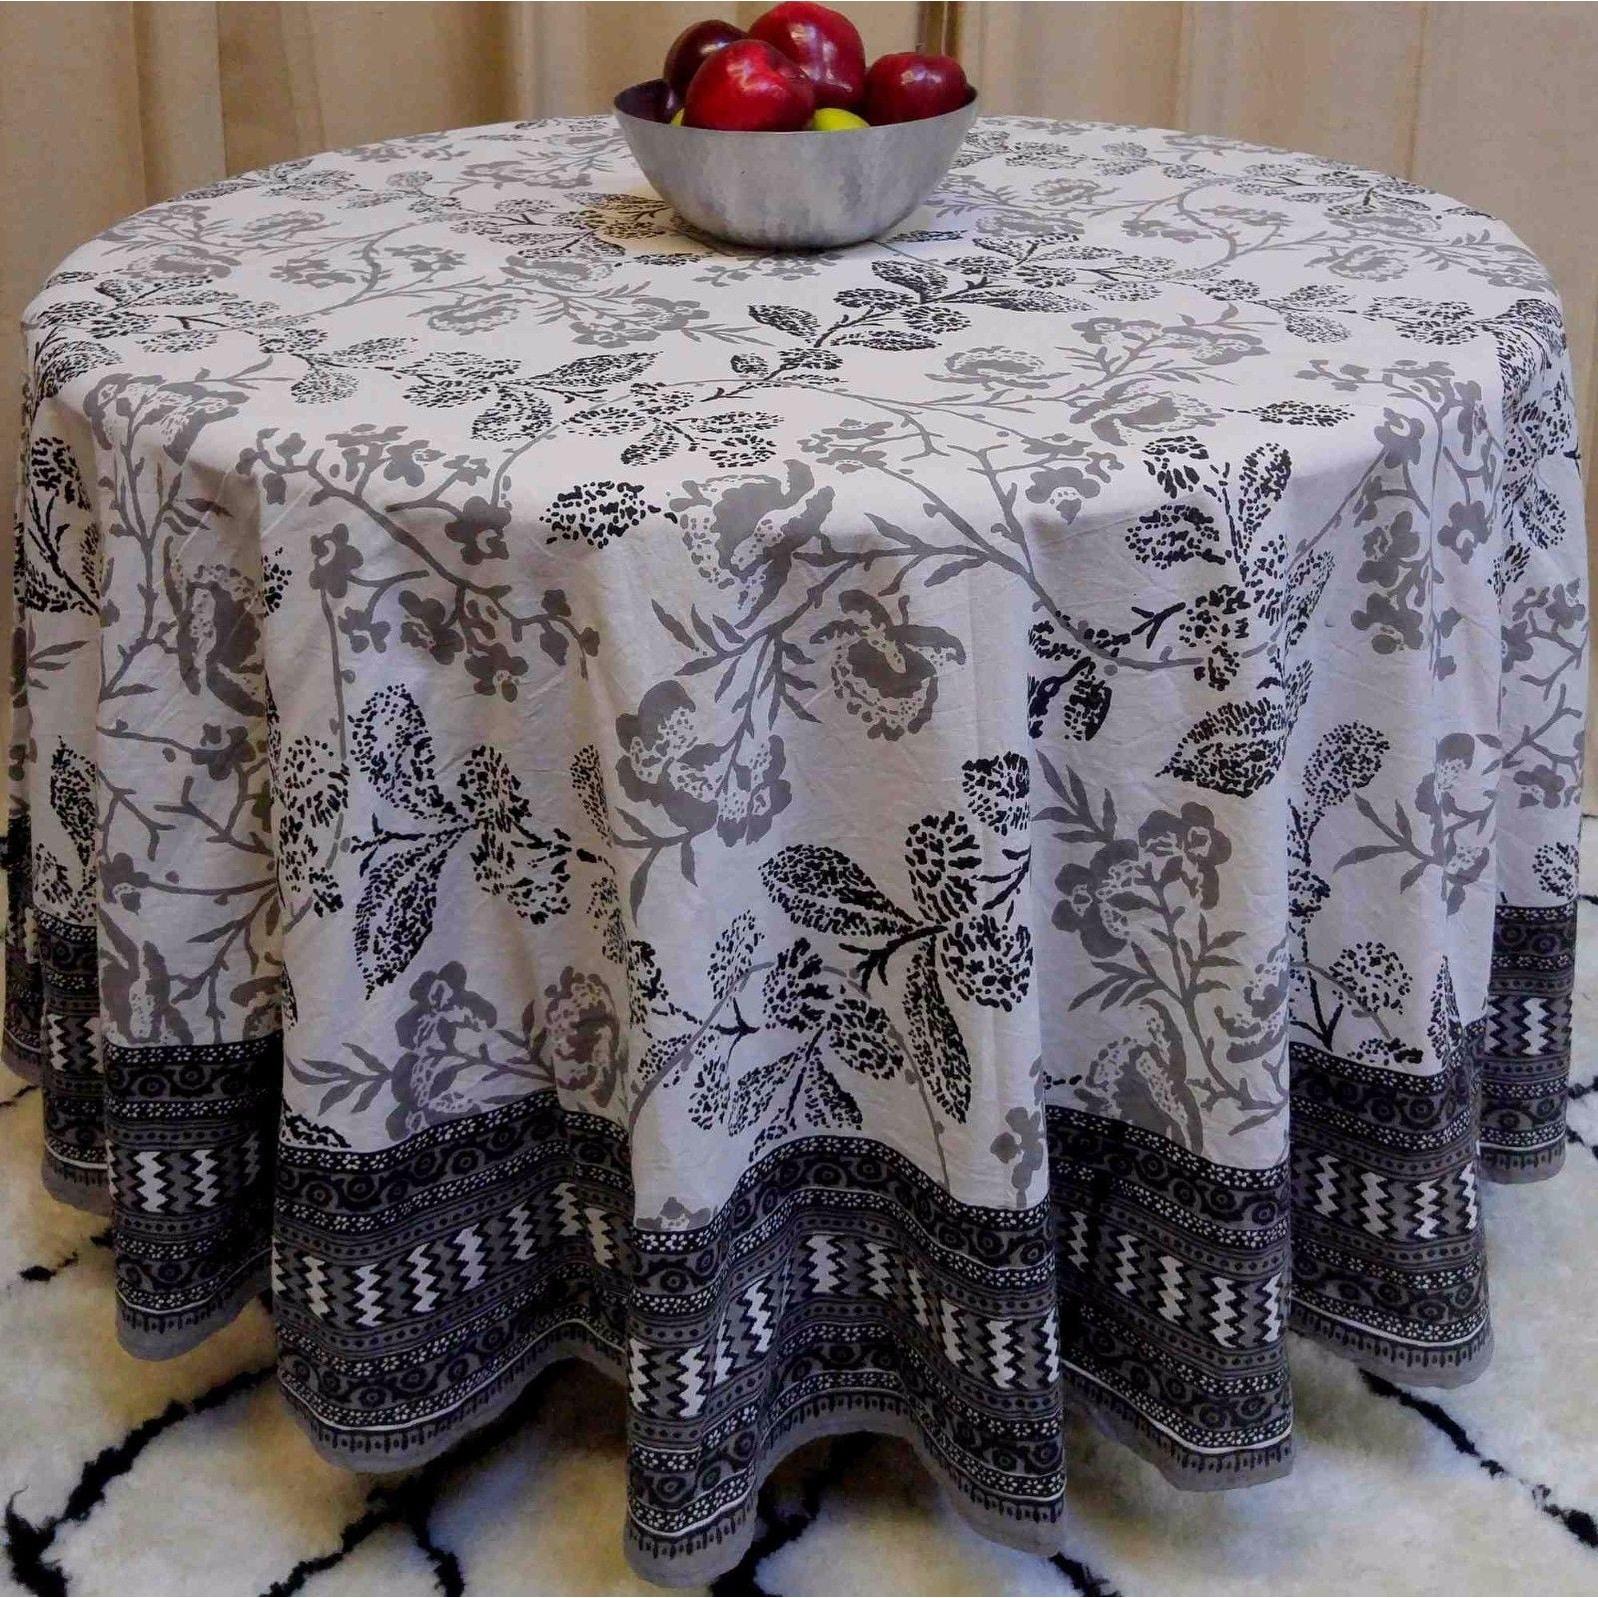 "Handmade 100% Cotton Elegant Floral Tablecloth 90"" Round Gray White - Thumbnail 0"